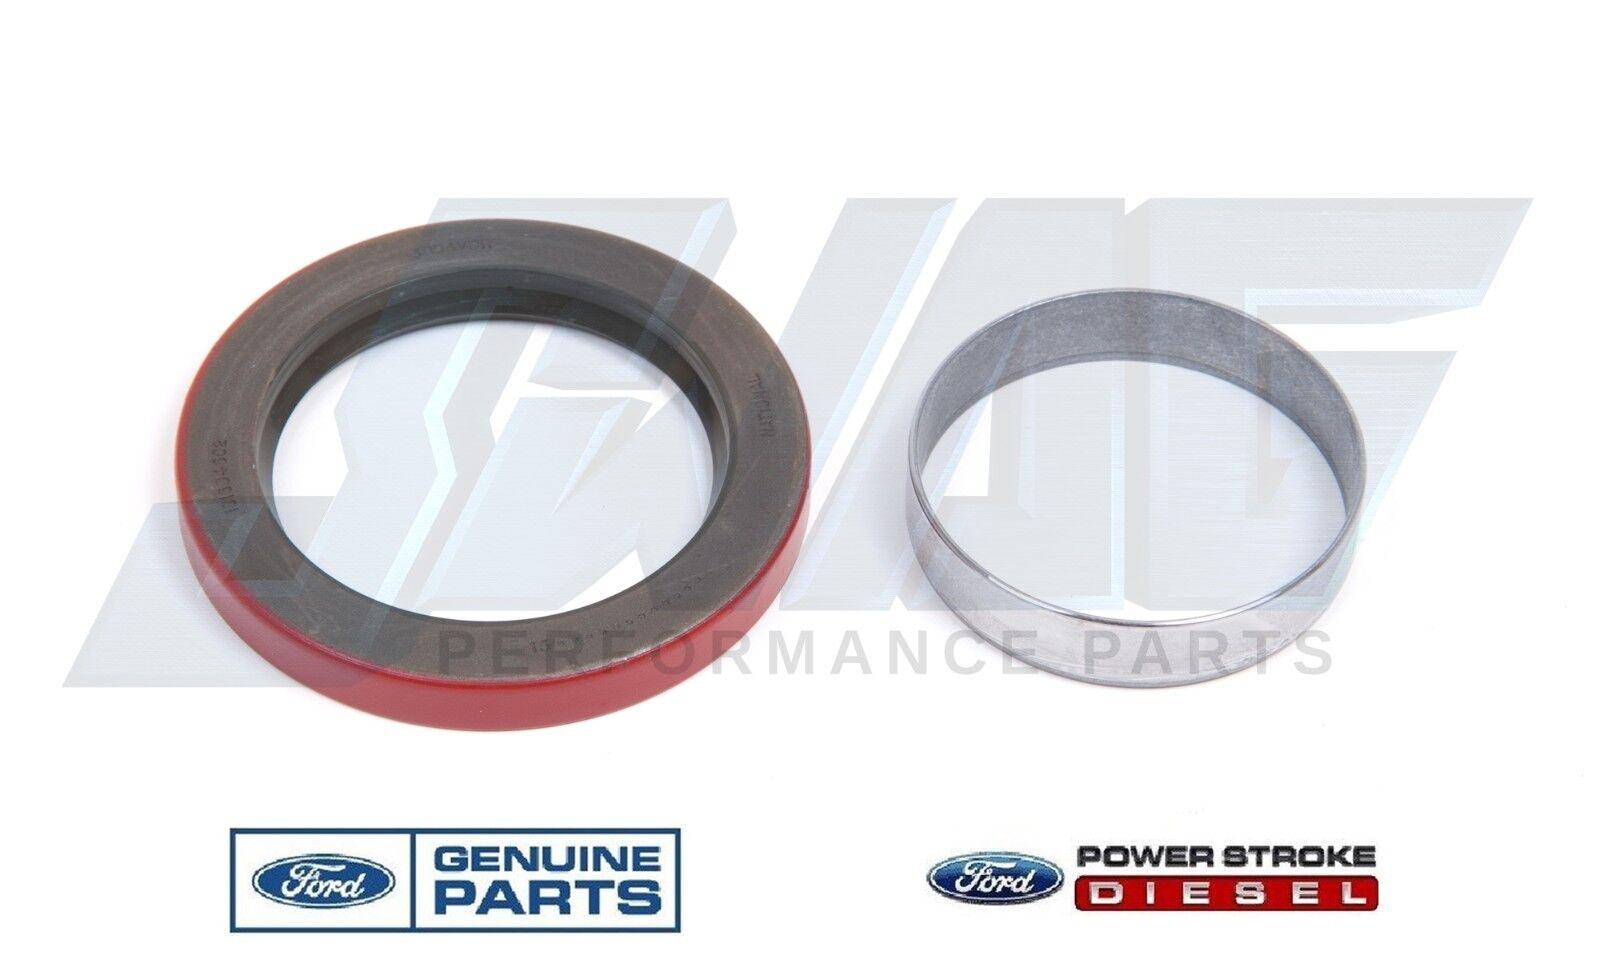 Details about 7 3L Powerstroke Diesel OEM Genuine Ford Front Crankshaft  Main Seal F250 F350